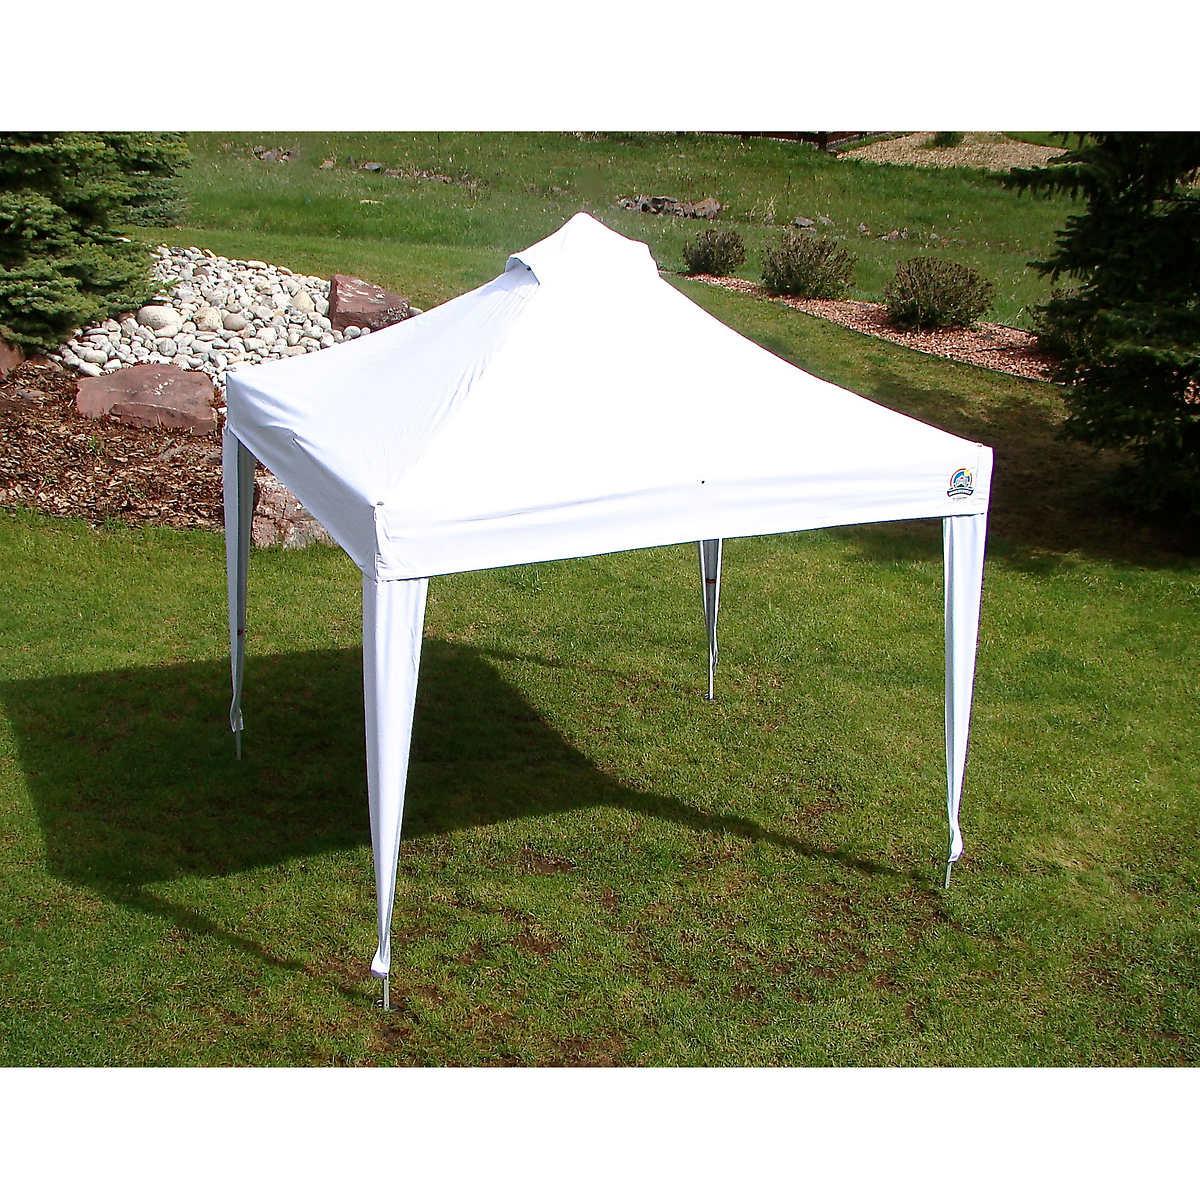 undercover 10 u0027 x 10 u0027 professional grade aluminum instant canopy